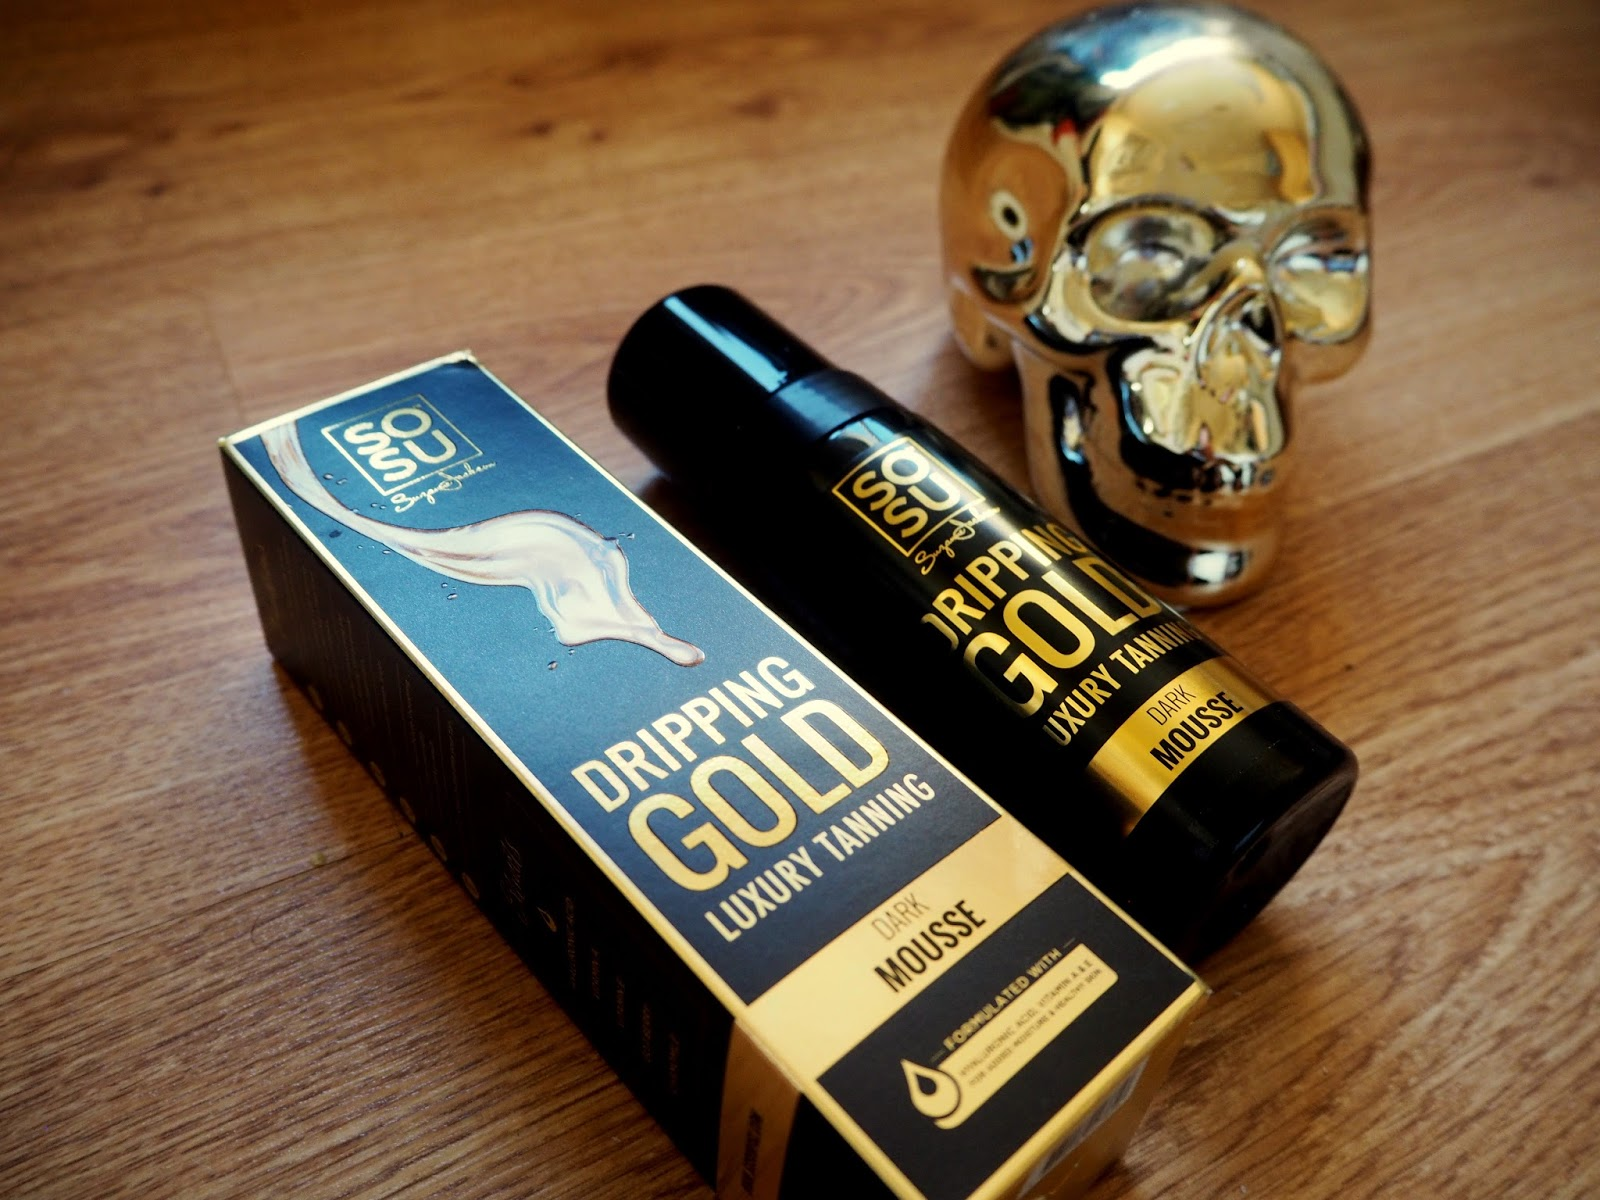 955cc535855 SoSu Dripping Gold Luxury Tan // Beauty Review | OhhheyitsAimee